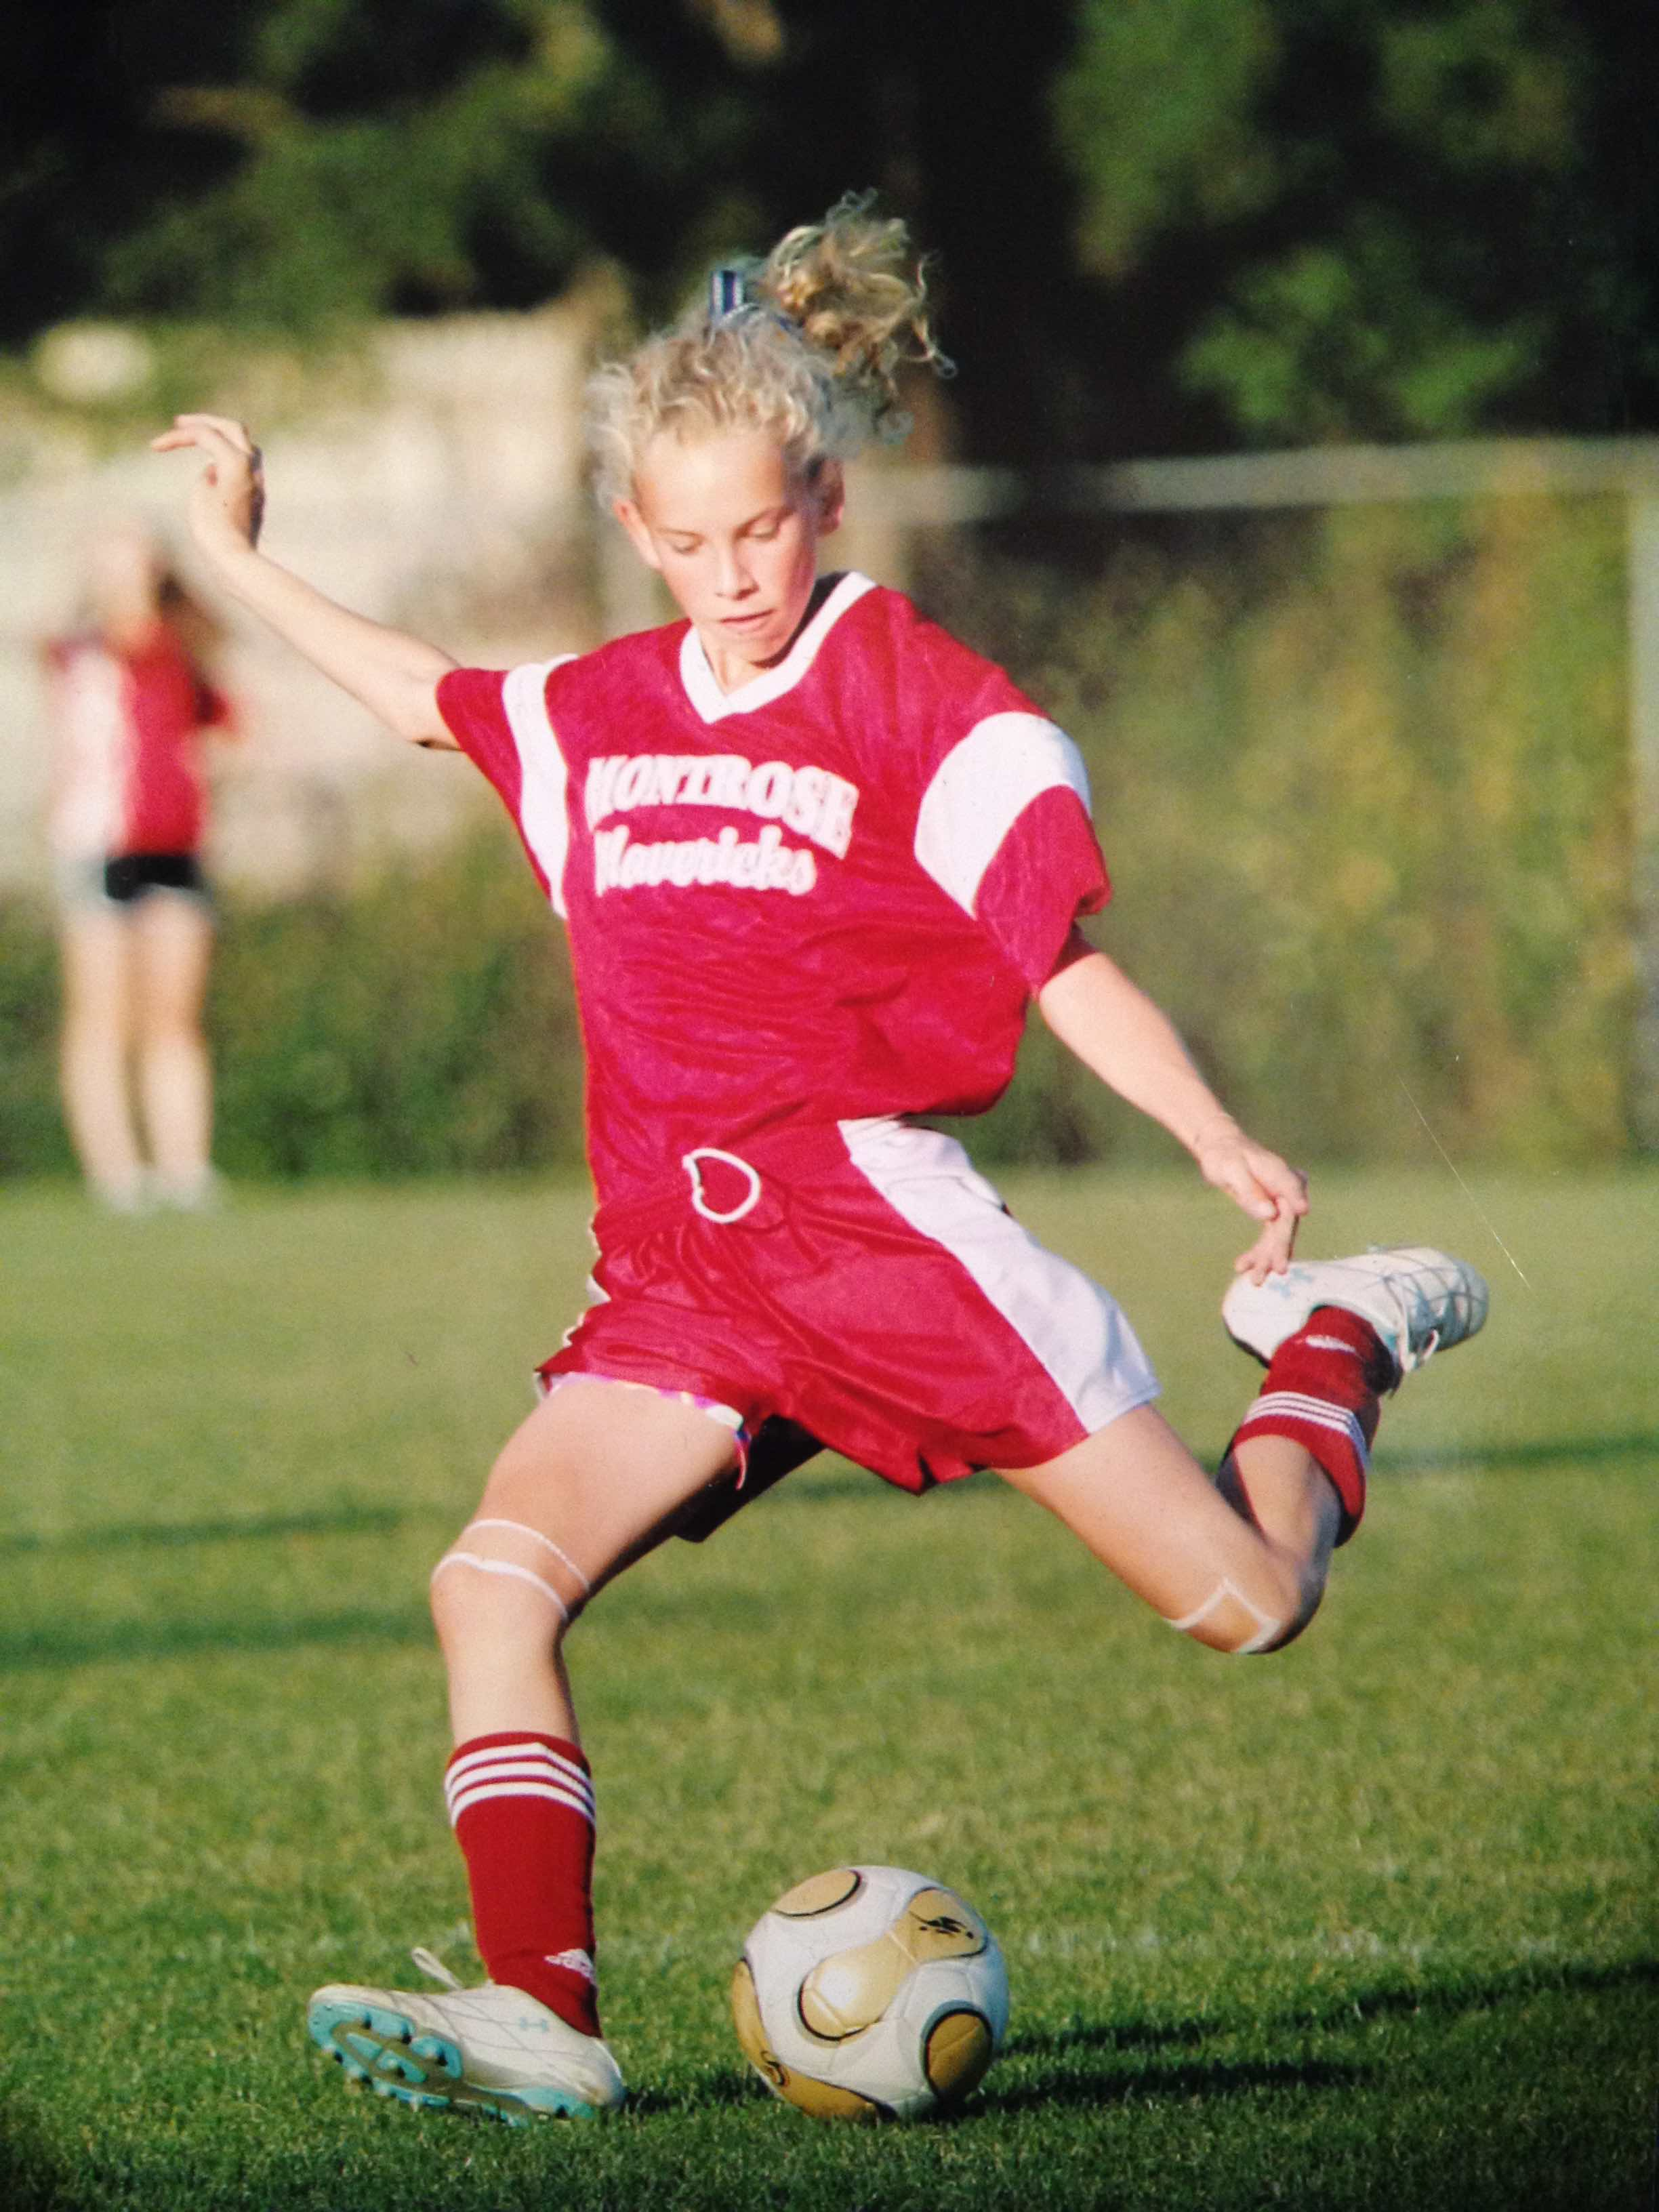 Elizabeth-Schickel-Soccer.jpg